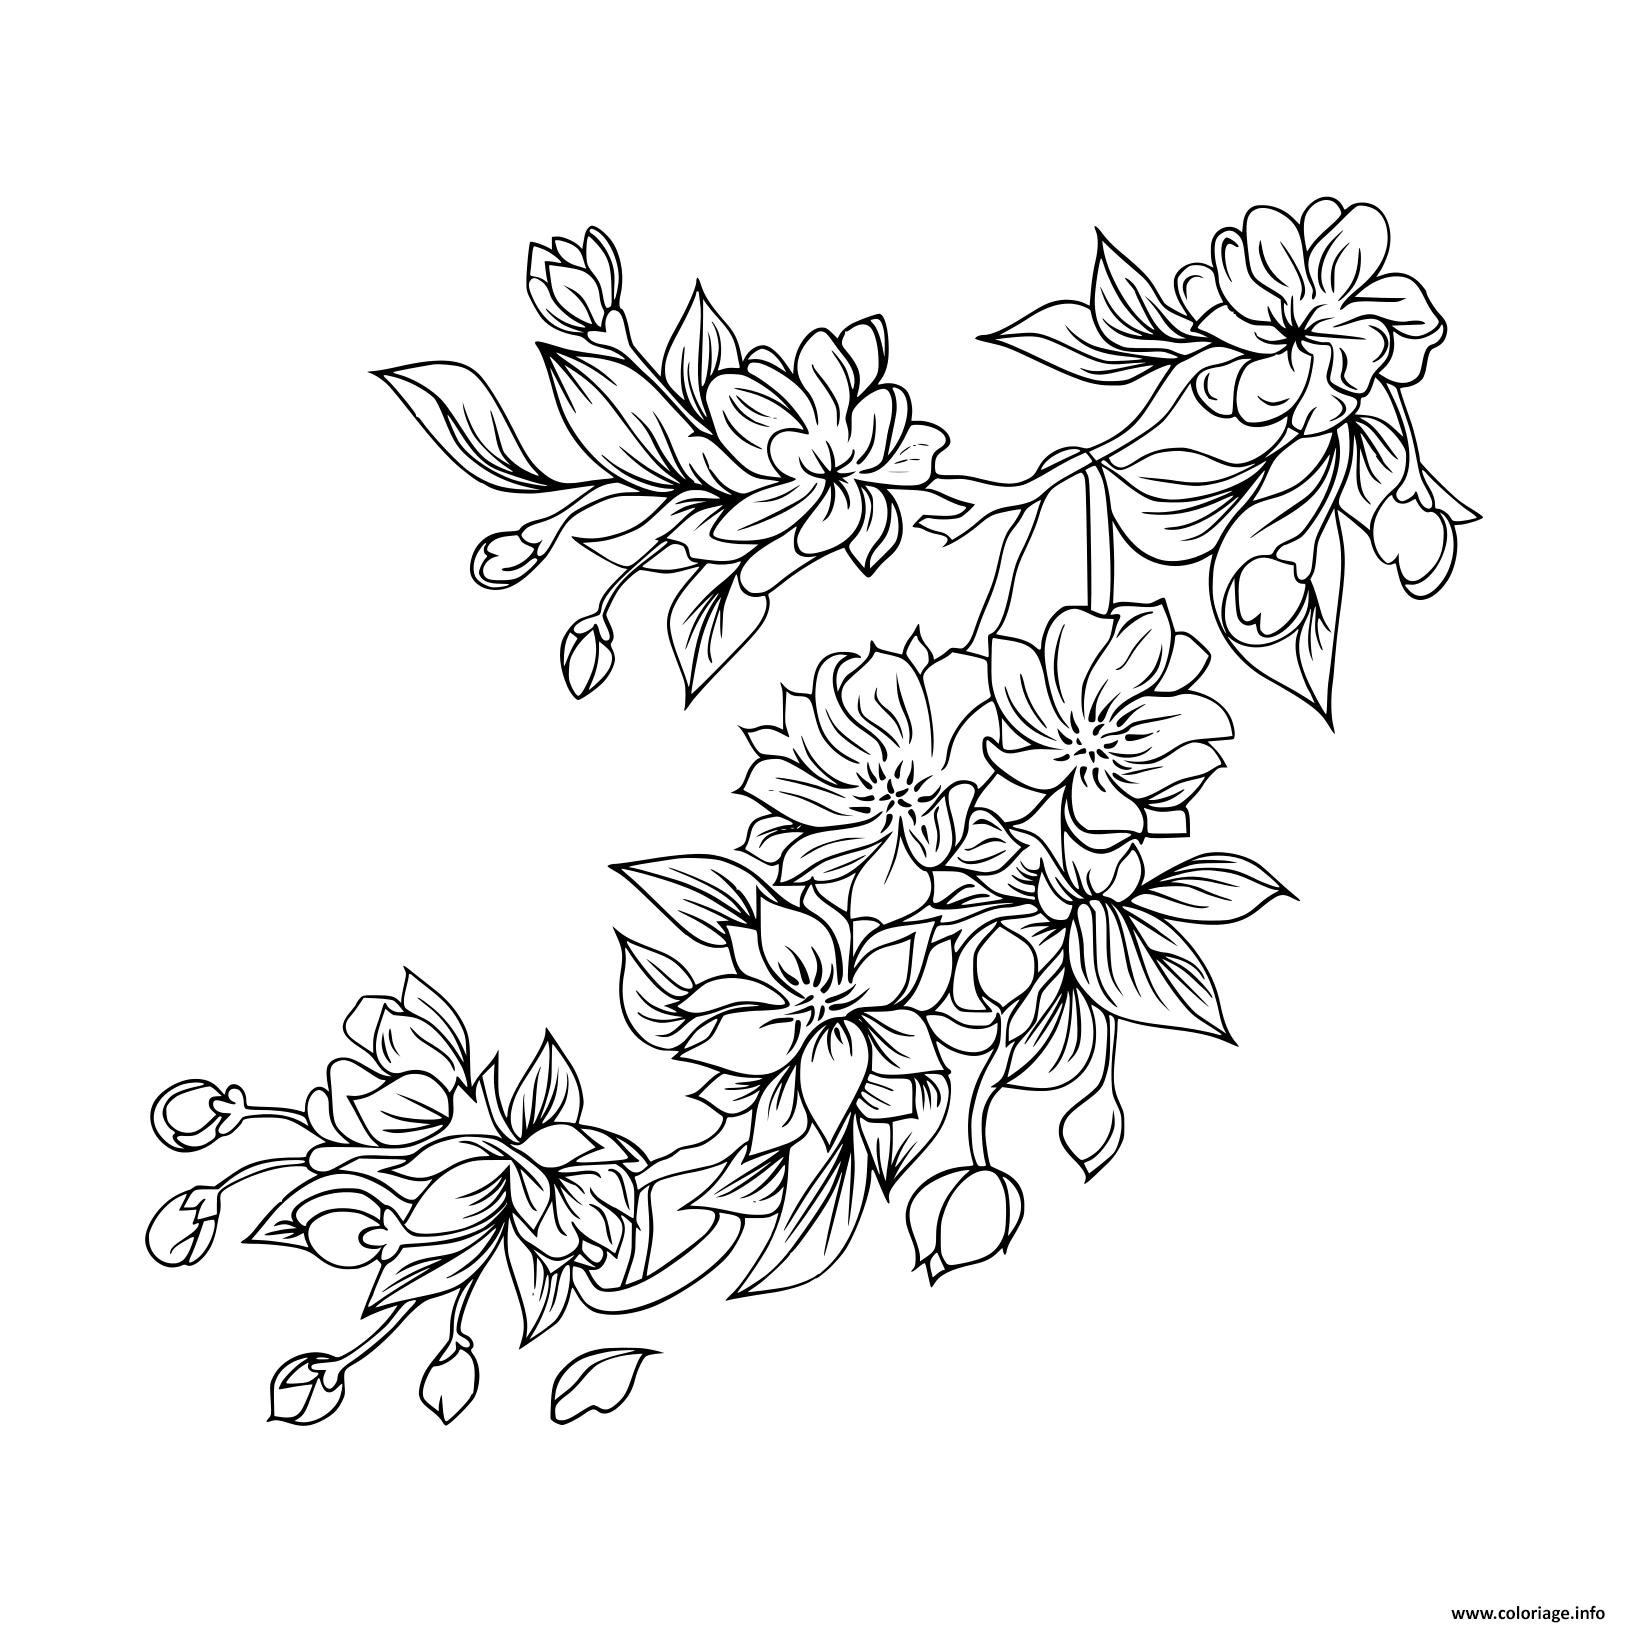 Coloriage Sakura Fleurs Japonaise dessin